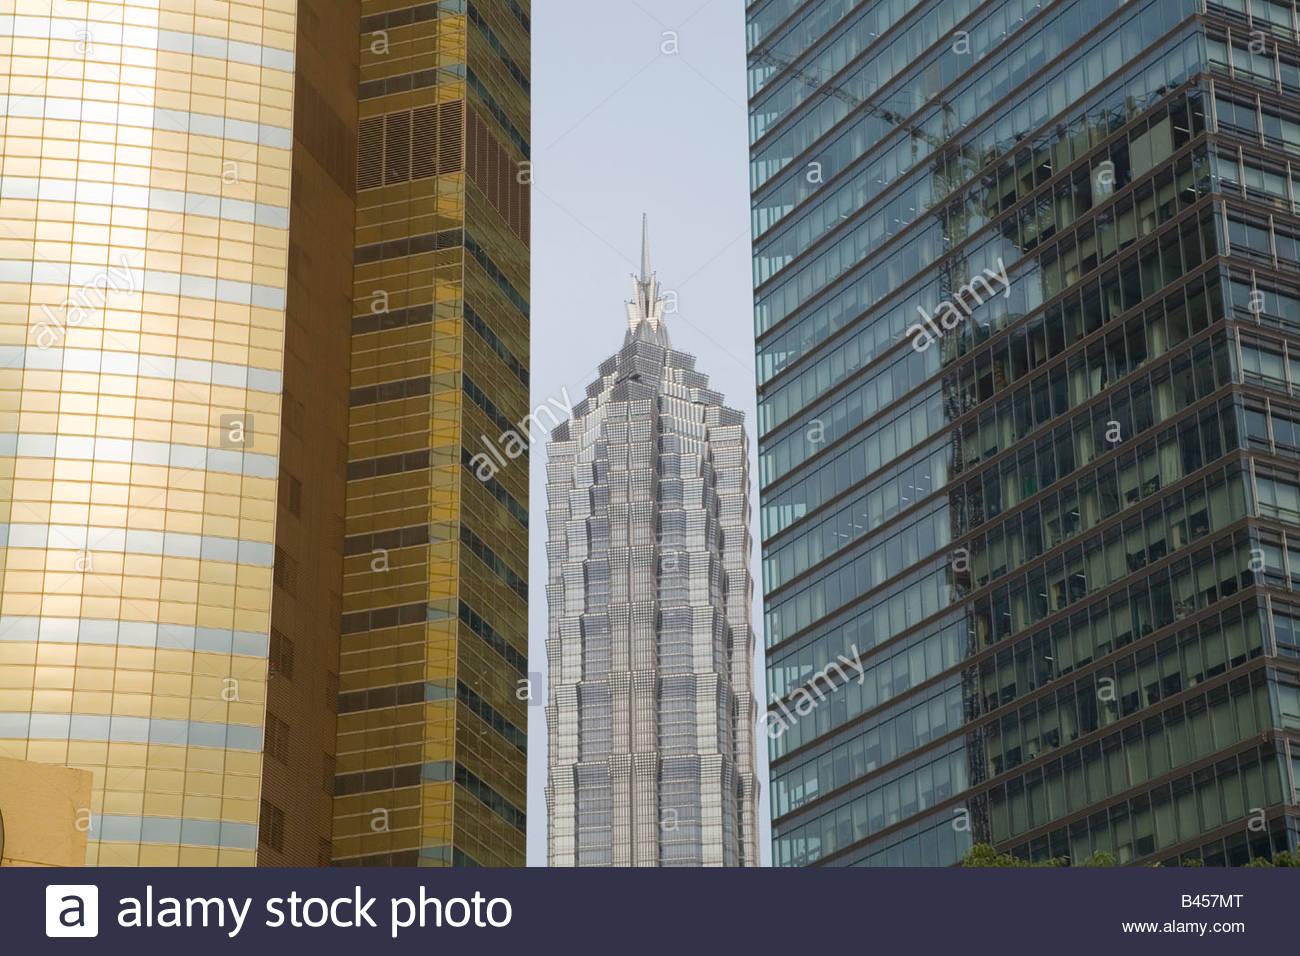 China, Shanghai, Pudong, Jin Mao Tower - Stock Image